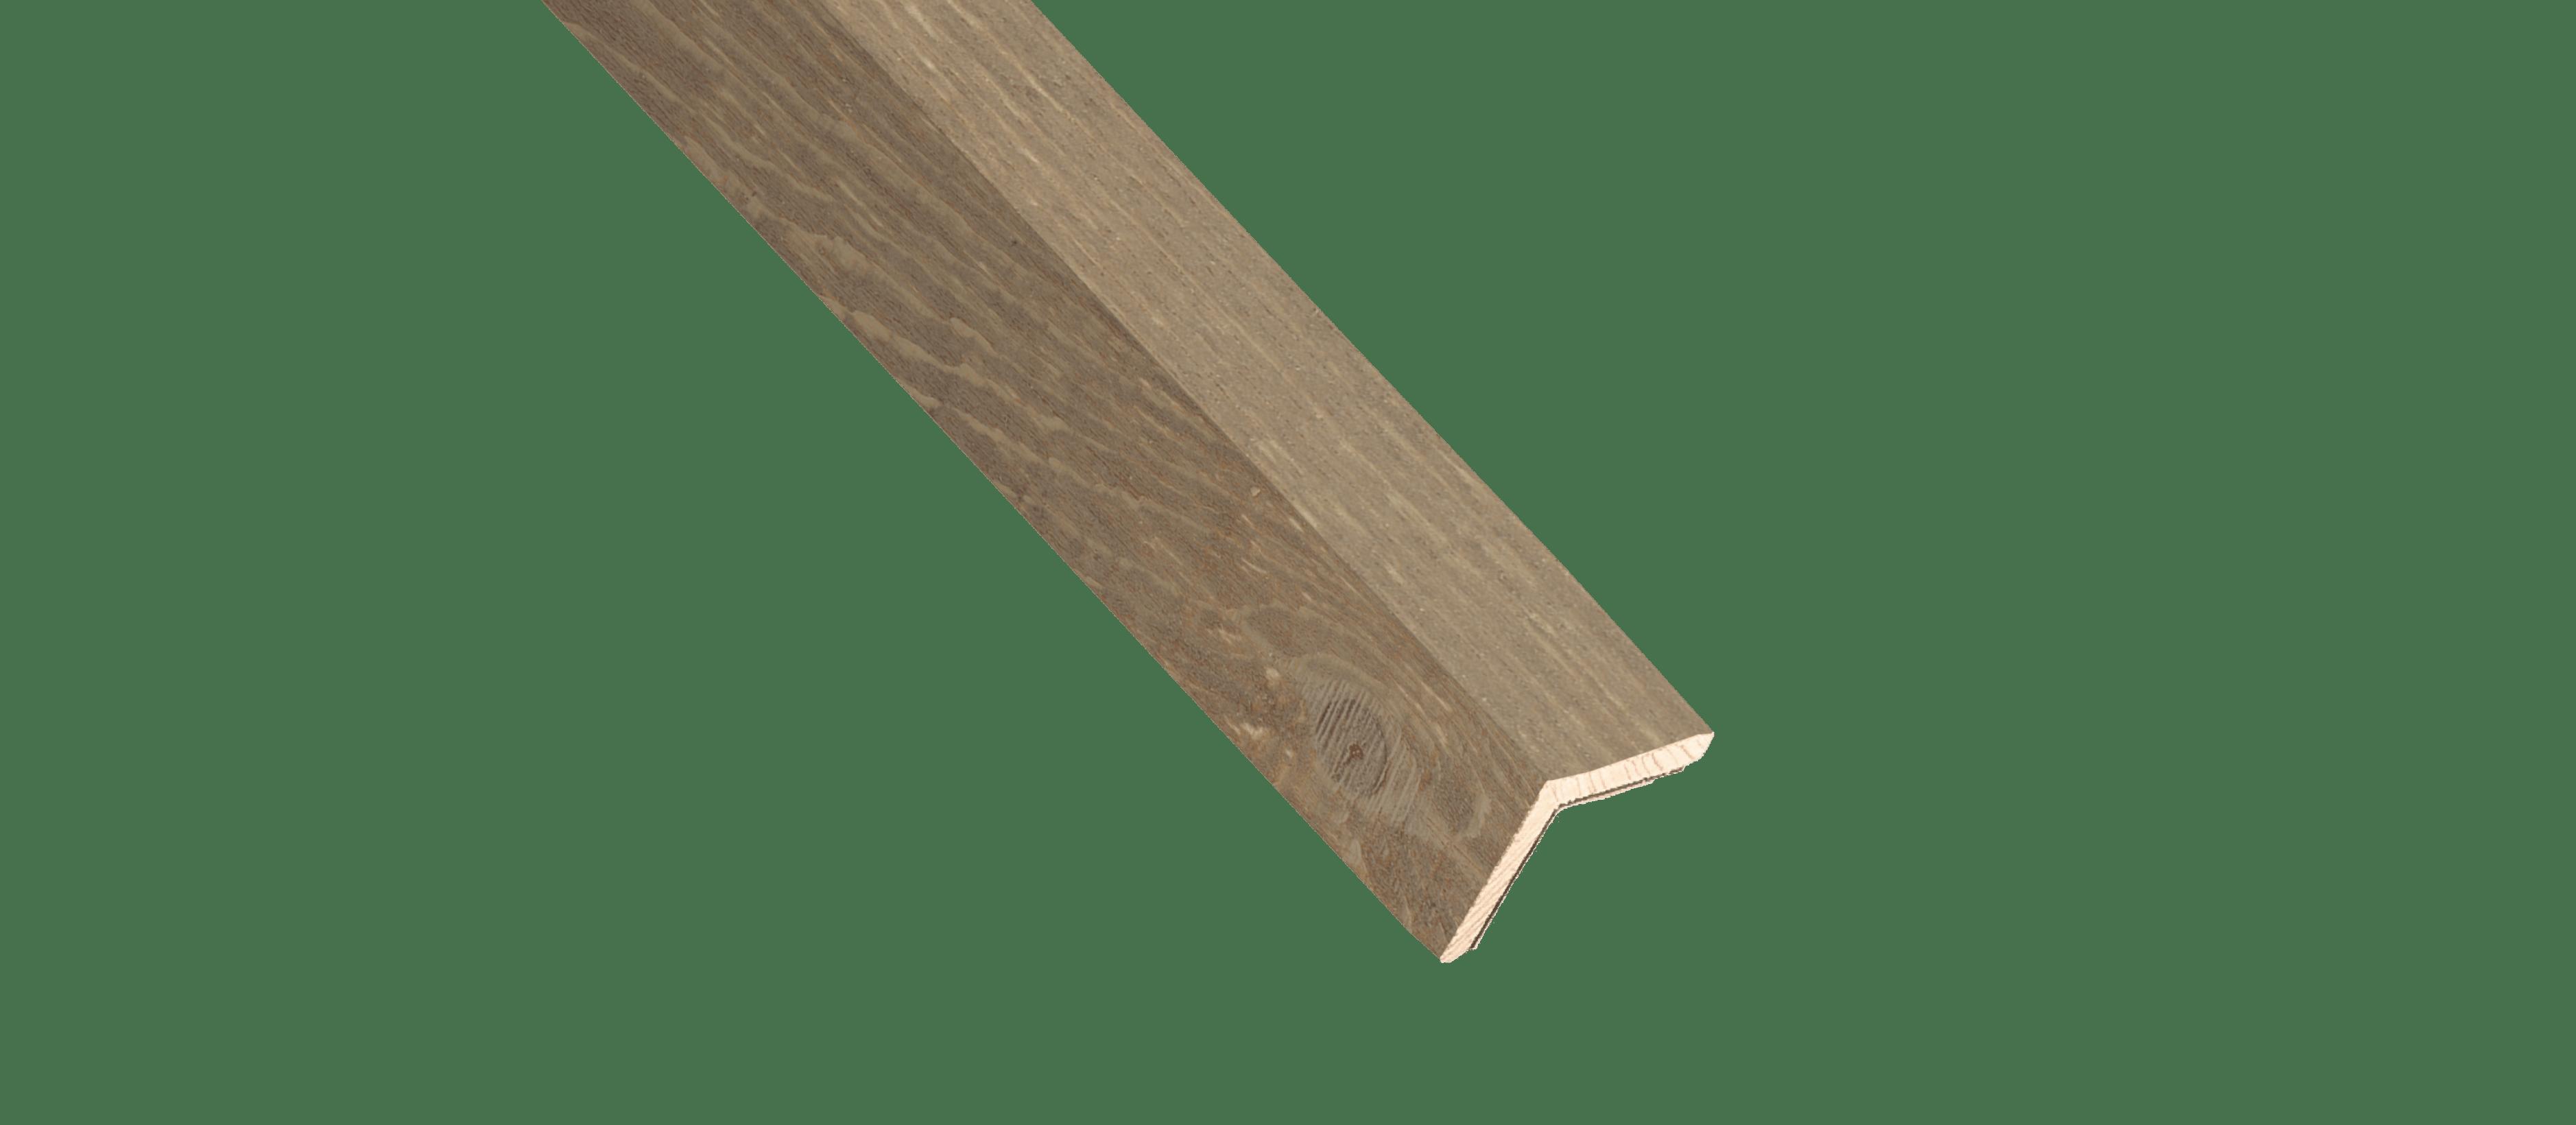 Sienna Wood Corner Trim Sample